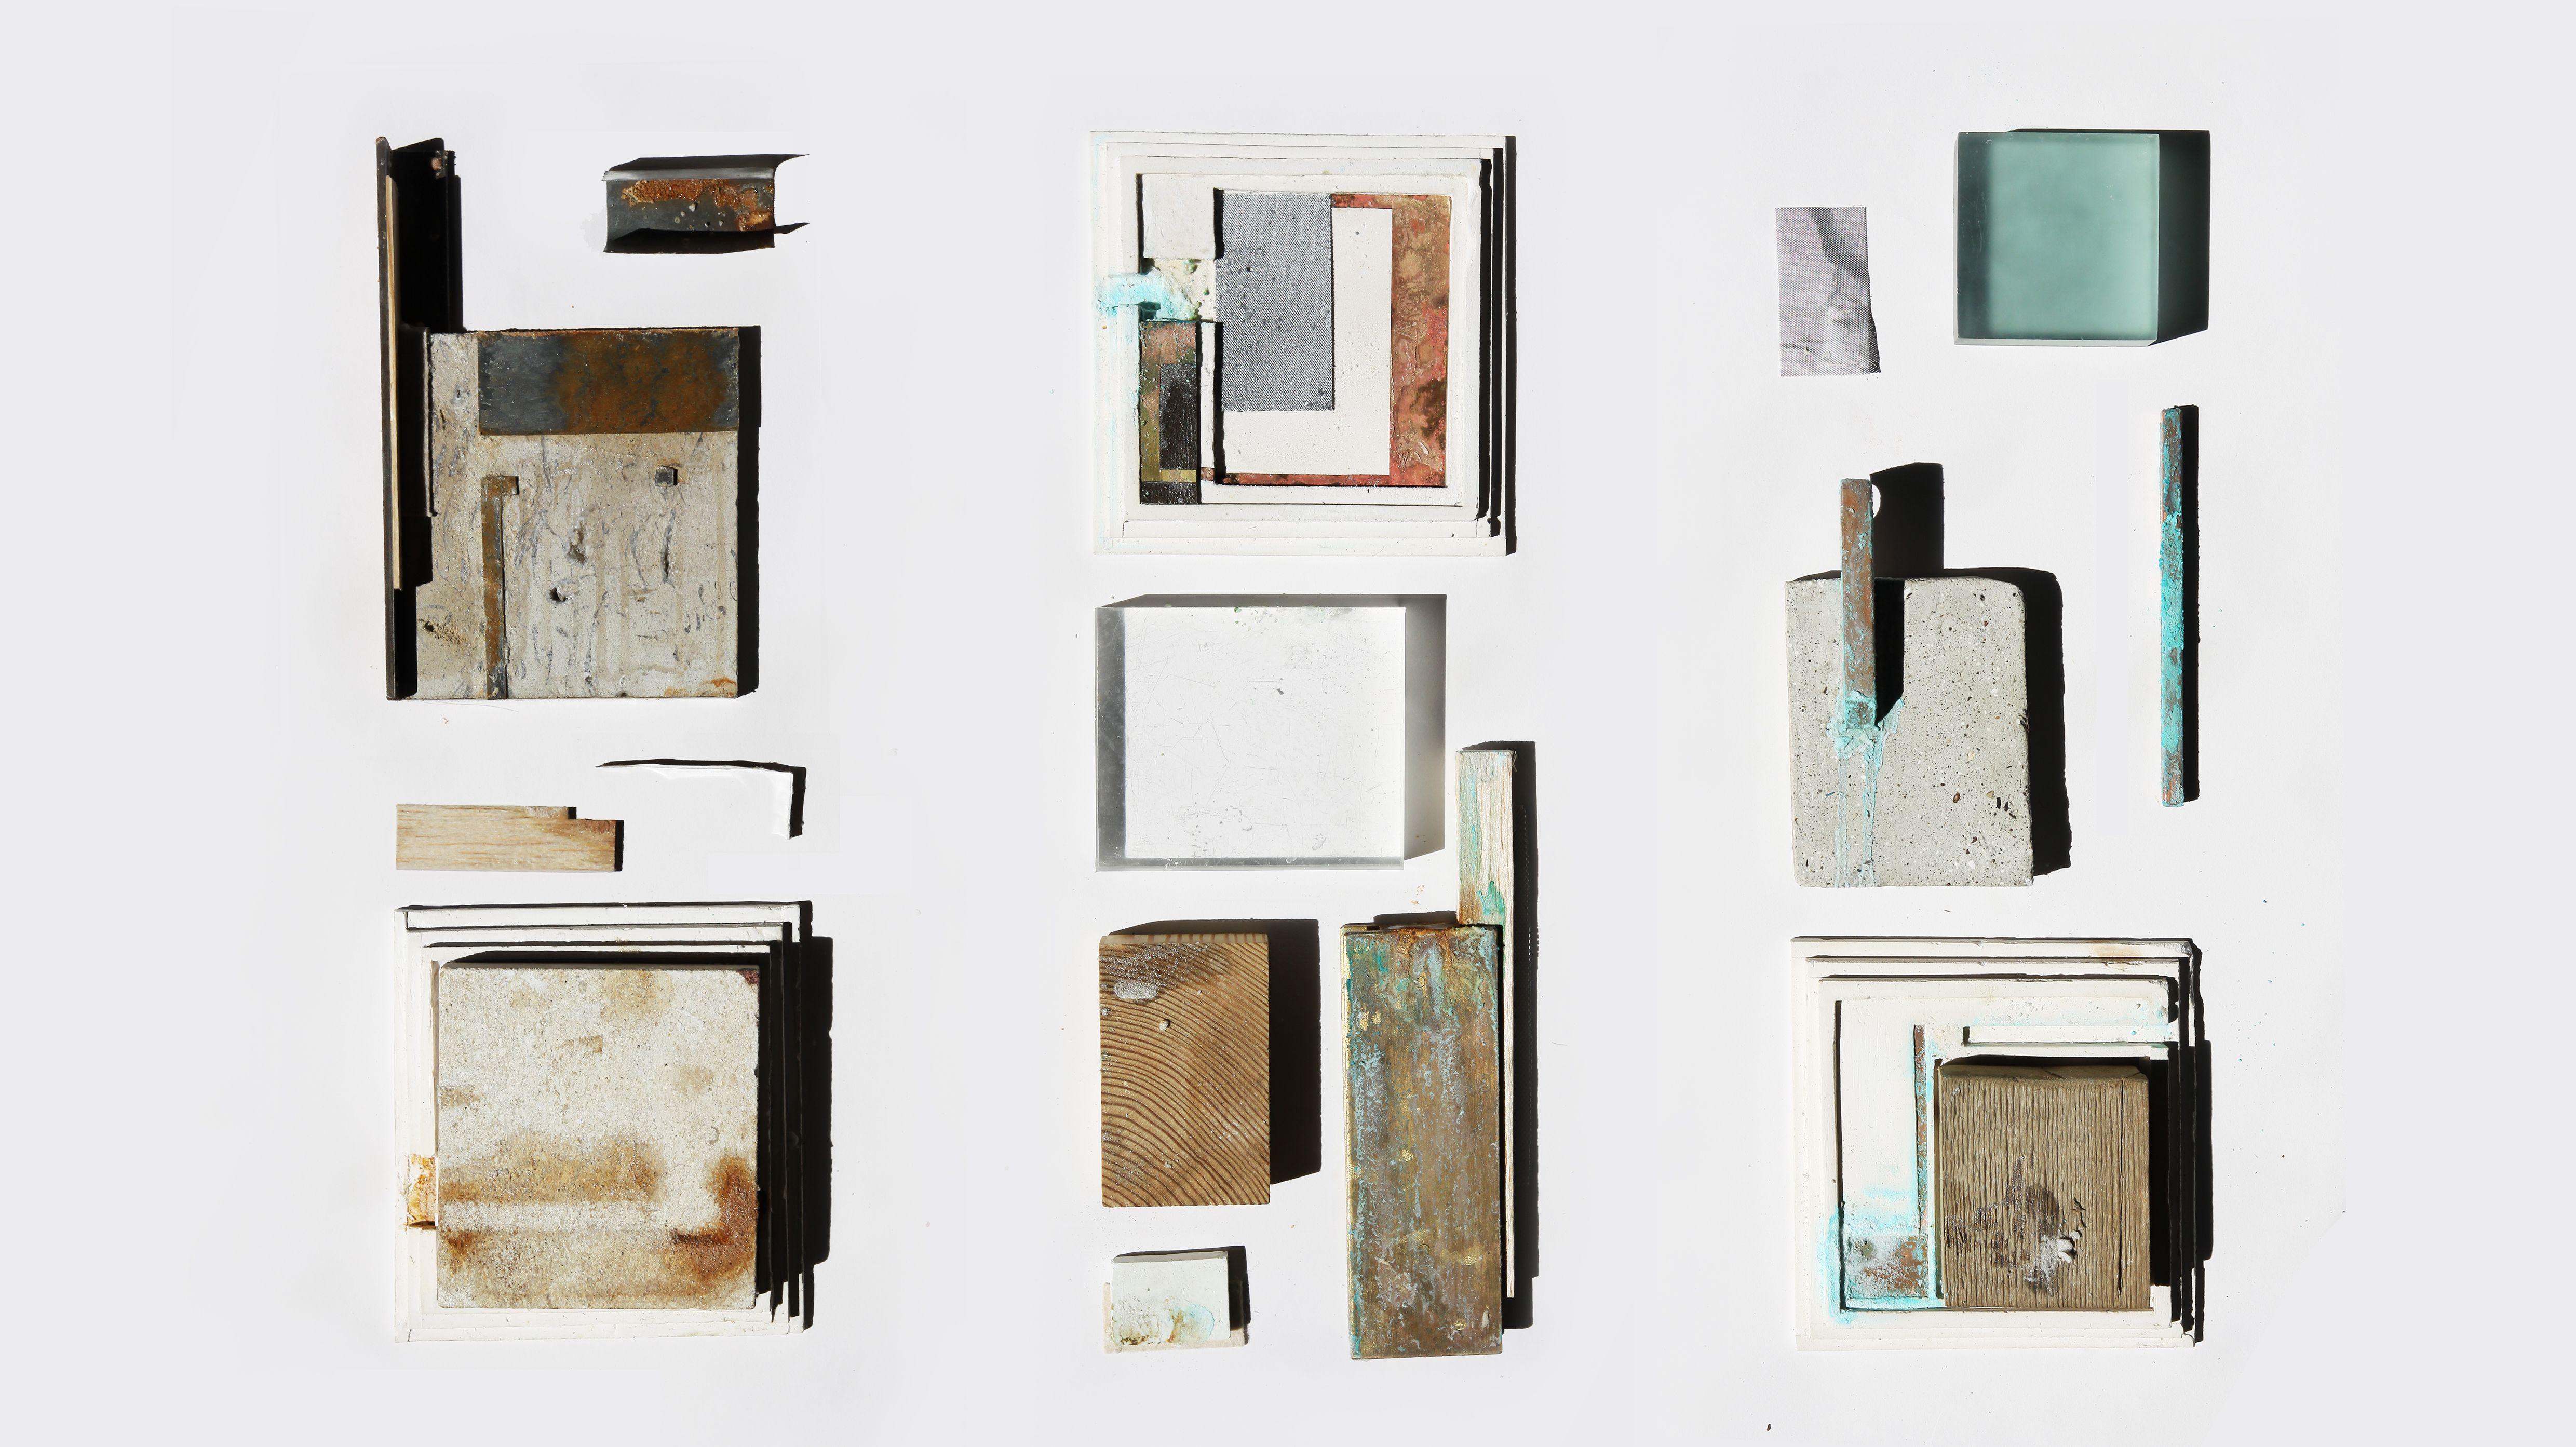 Ephemeral materials - Material ageing study, Weronika Walasz